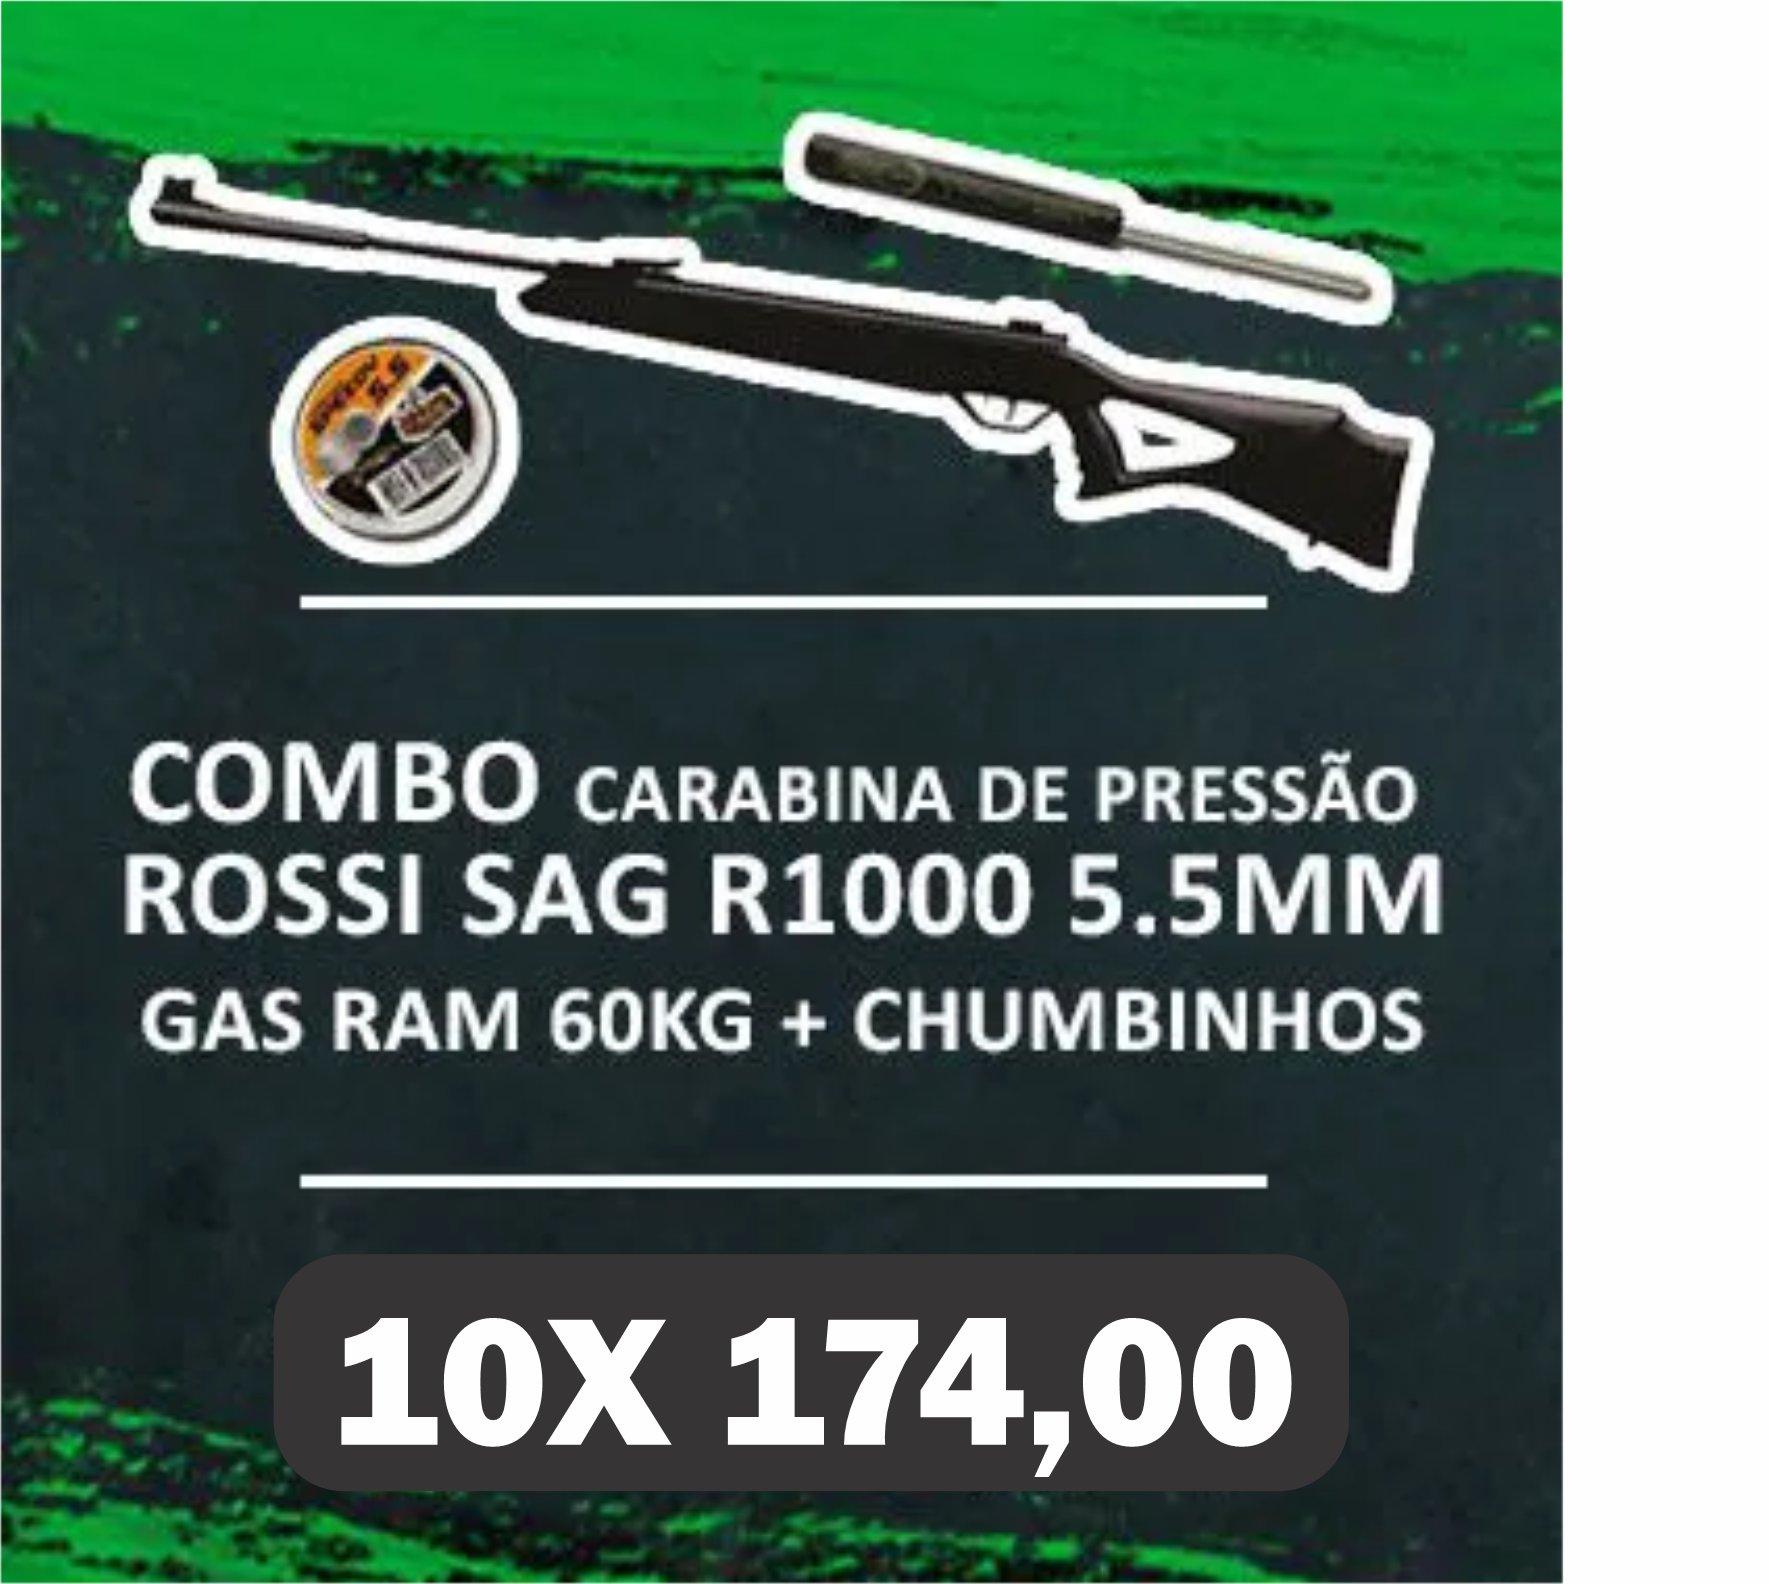 Consórcio - Carabina Rossi SAG R1000 5.5 gas ram 60kg